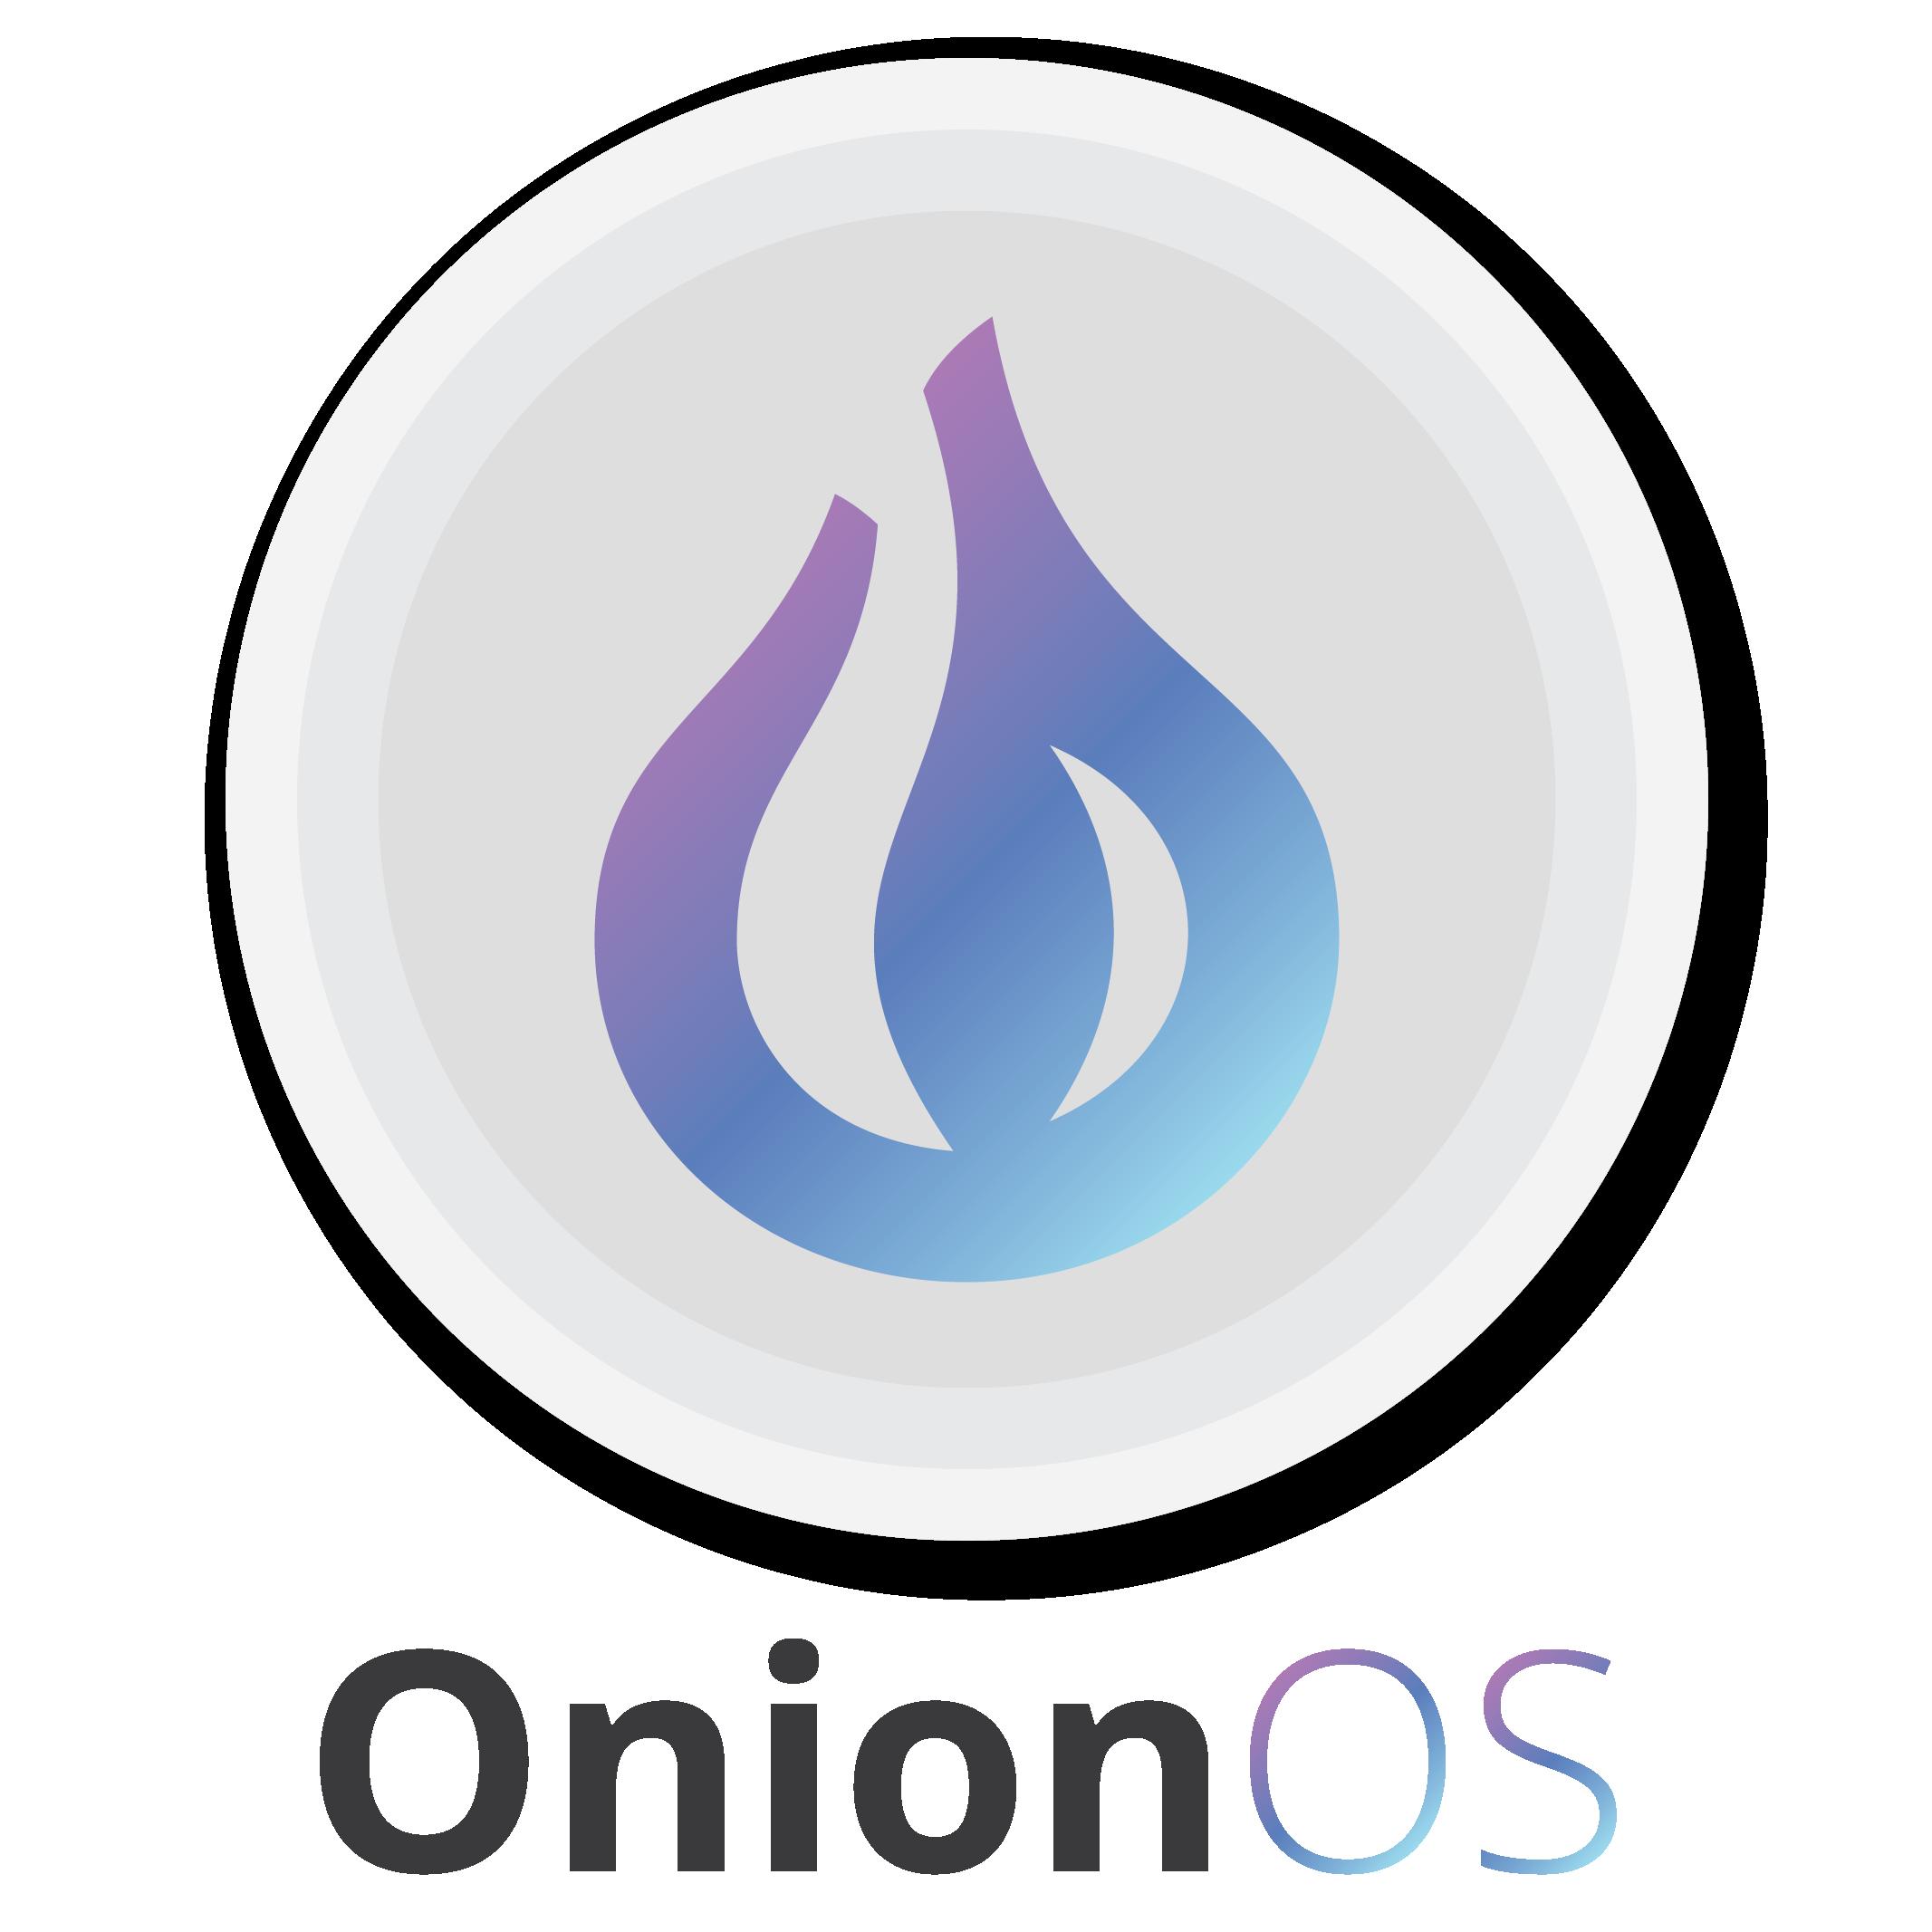 Introducing OnionOS